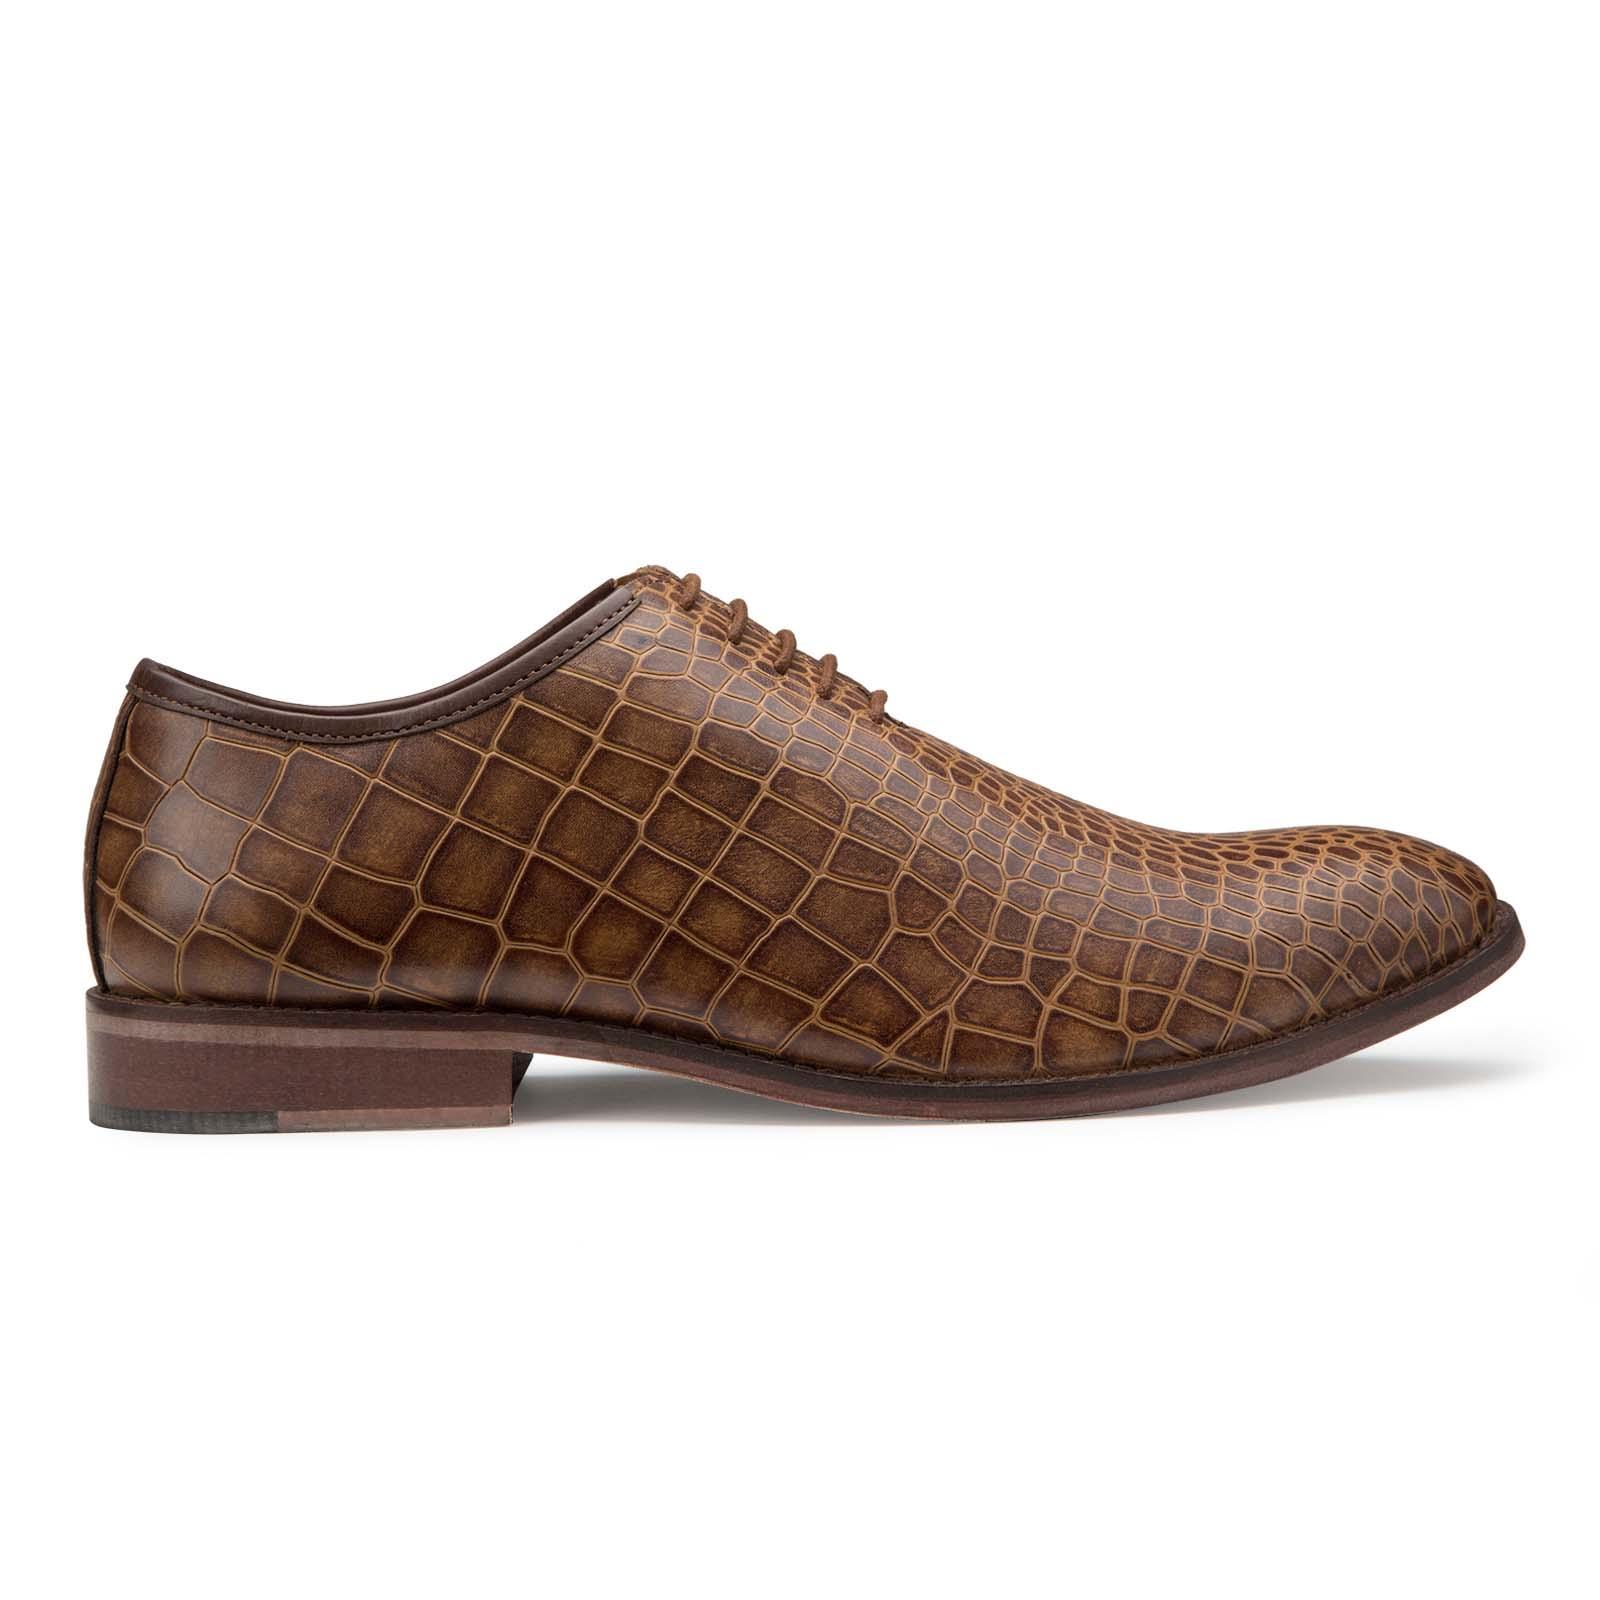 Tan Croc Textured Oxfords shoes